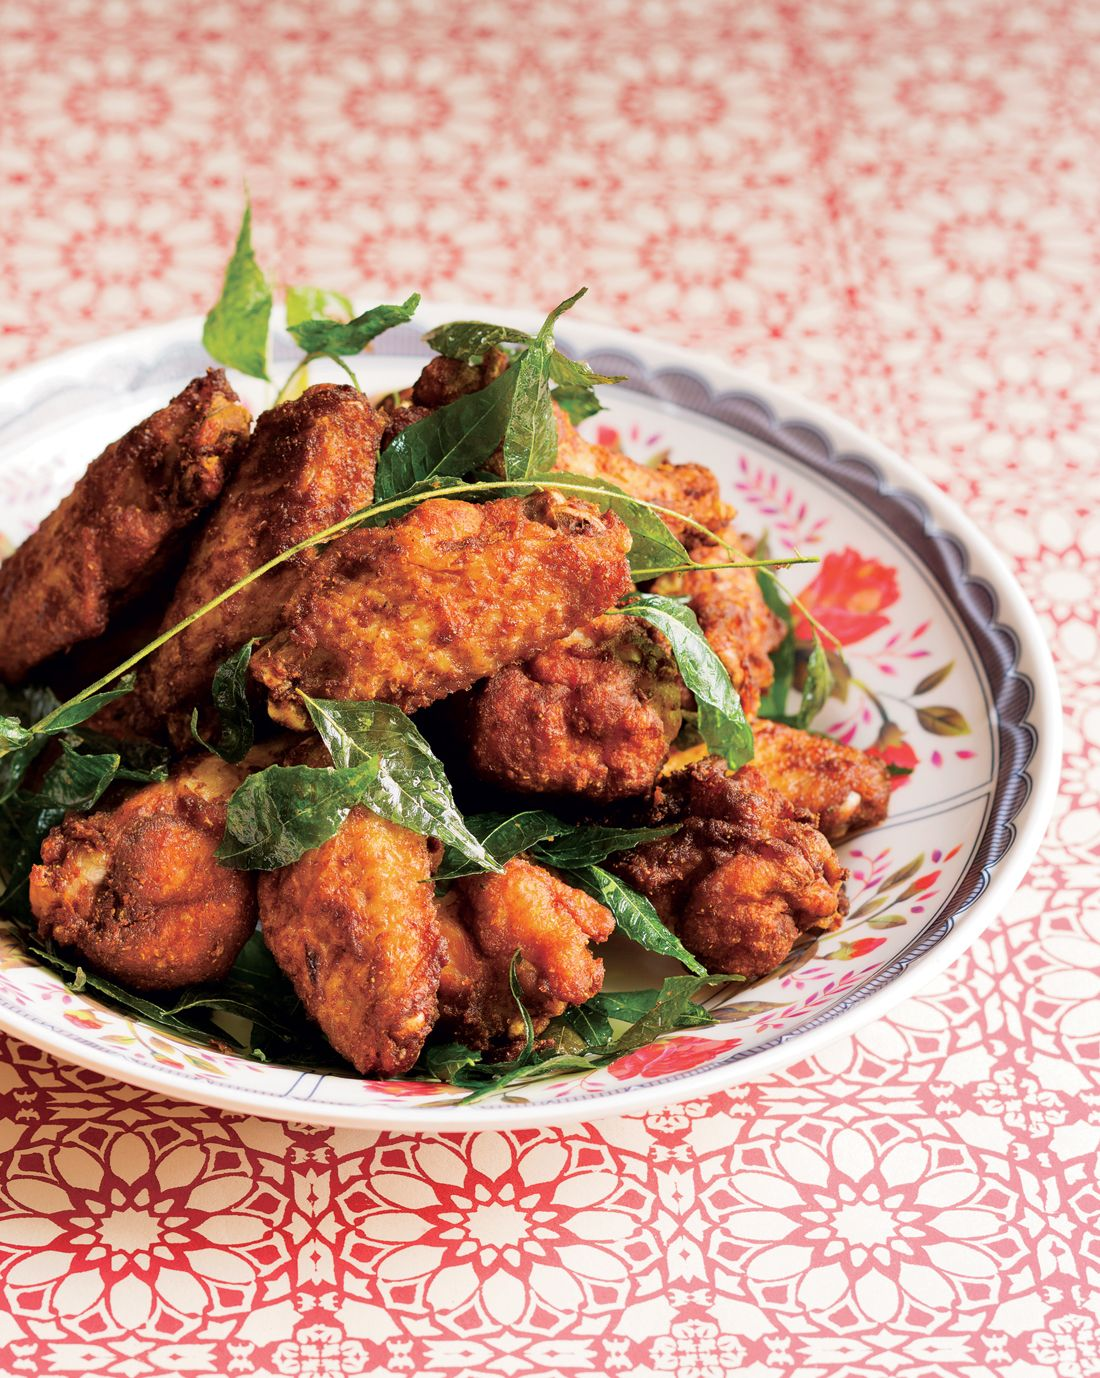 Malaysian kunyit turmeric fried chicken makes ideal as finger malaysian kunyit turmeric fried chicken makes ideal as finger food or a casual forumfinder Choice Image